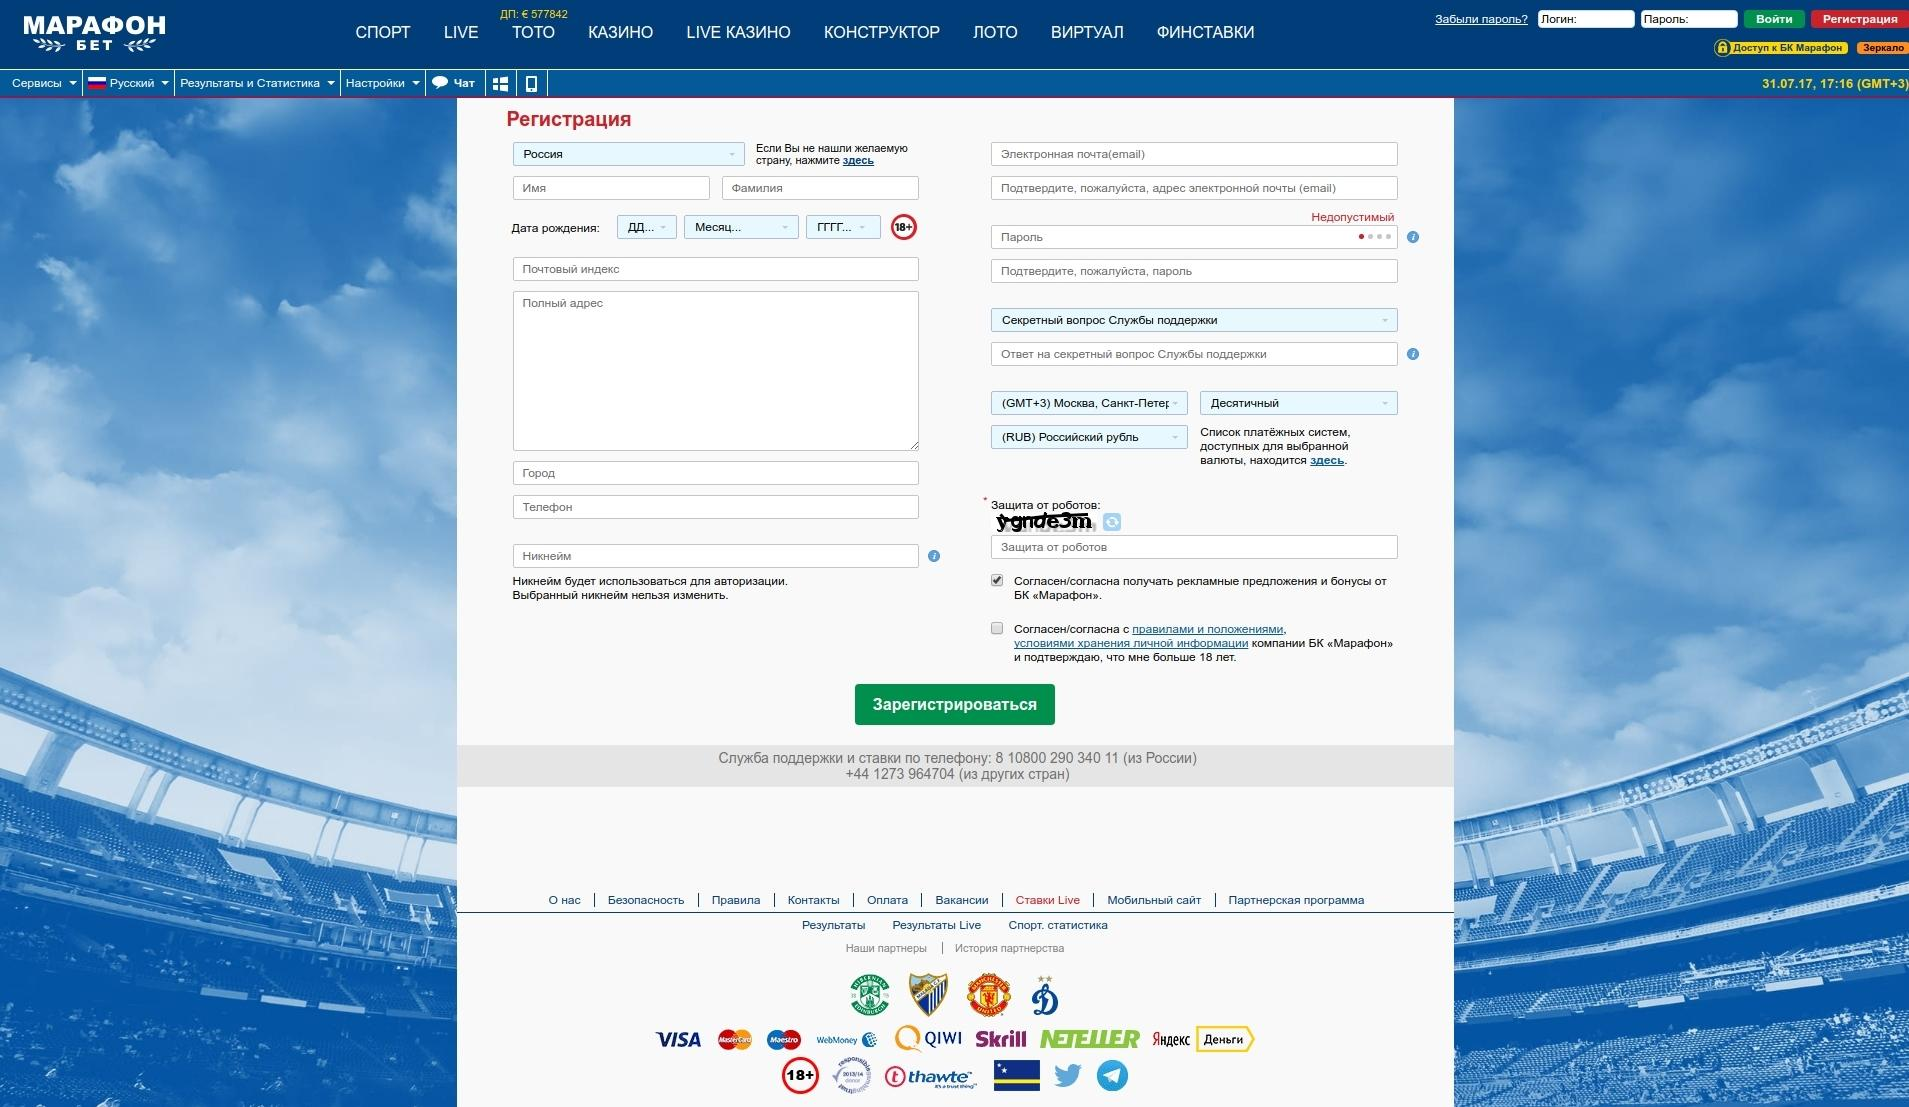 официальный сайт казино марафон онлайн зеркало